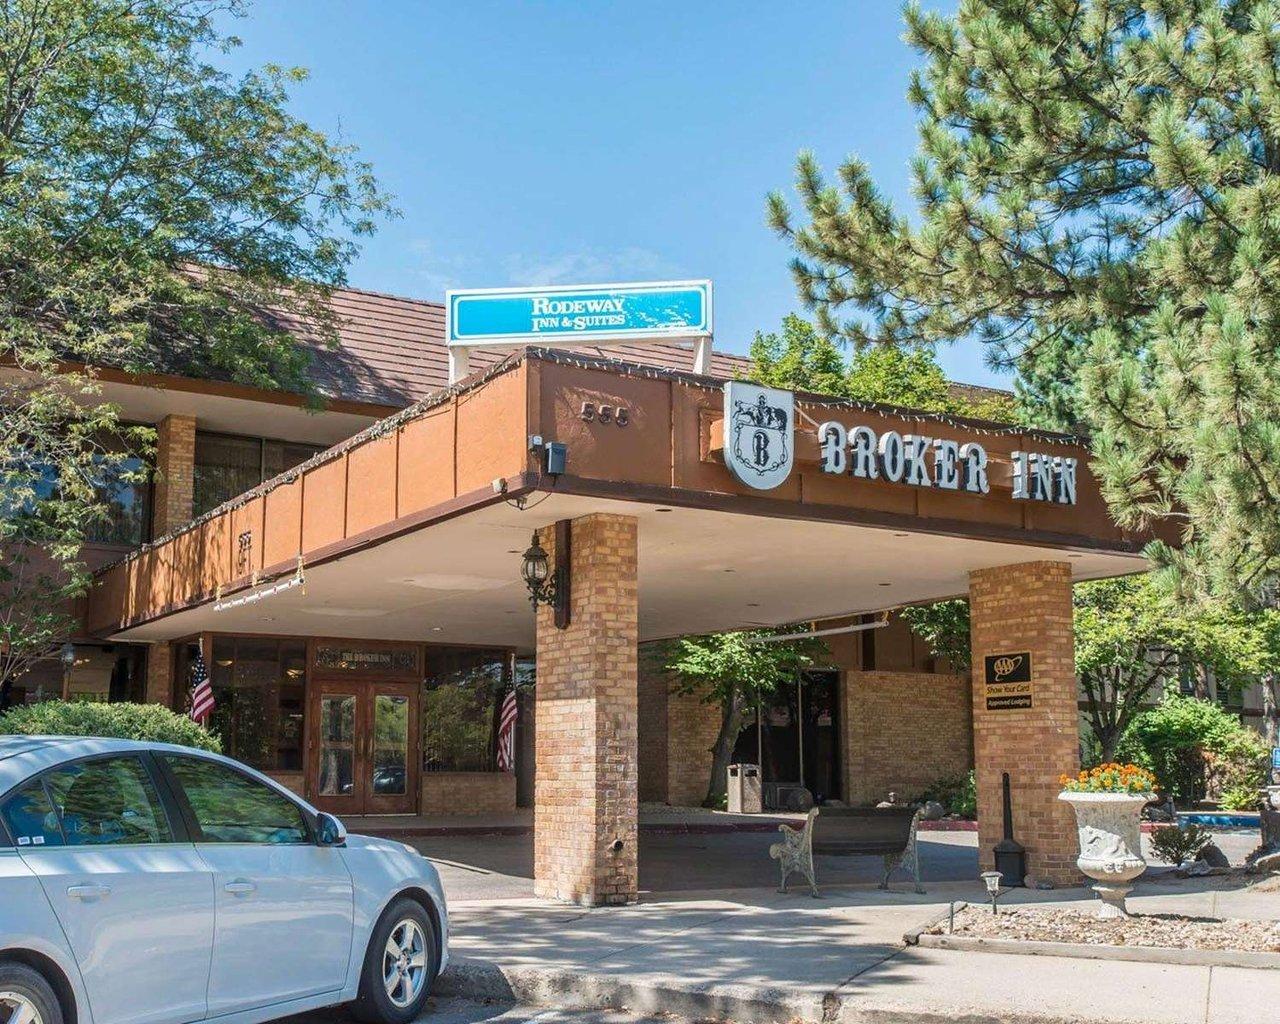 rodeway inn suites at the boulder broker 67 8 3 updated rh tripadvisor com